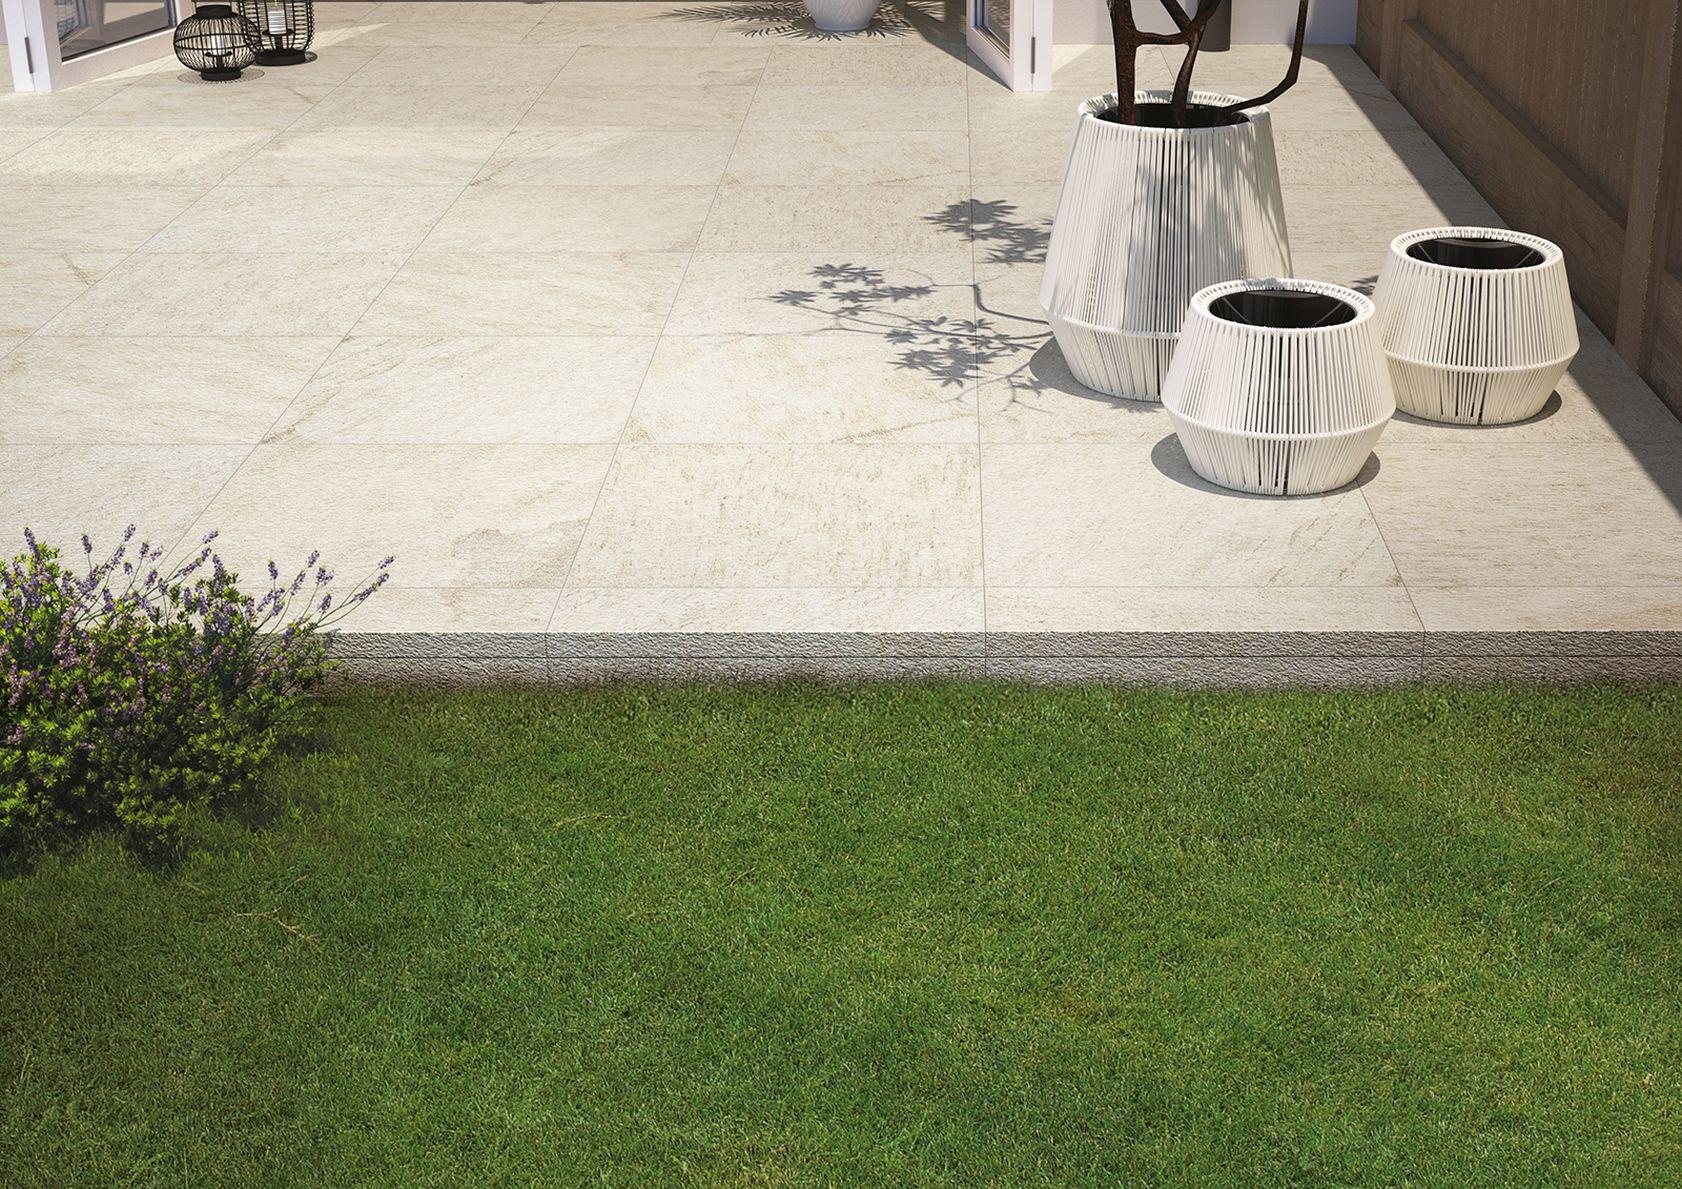 Multiquartz20 thick outdoor porcelain stoneware marazzi multiquartz20 ceramic tiles marazzi5179 doublecrazyfo Choice Image